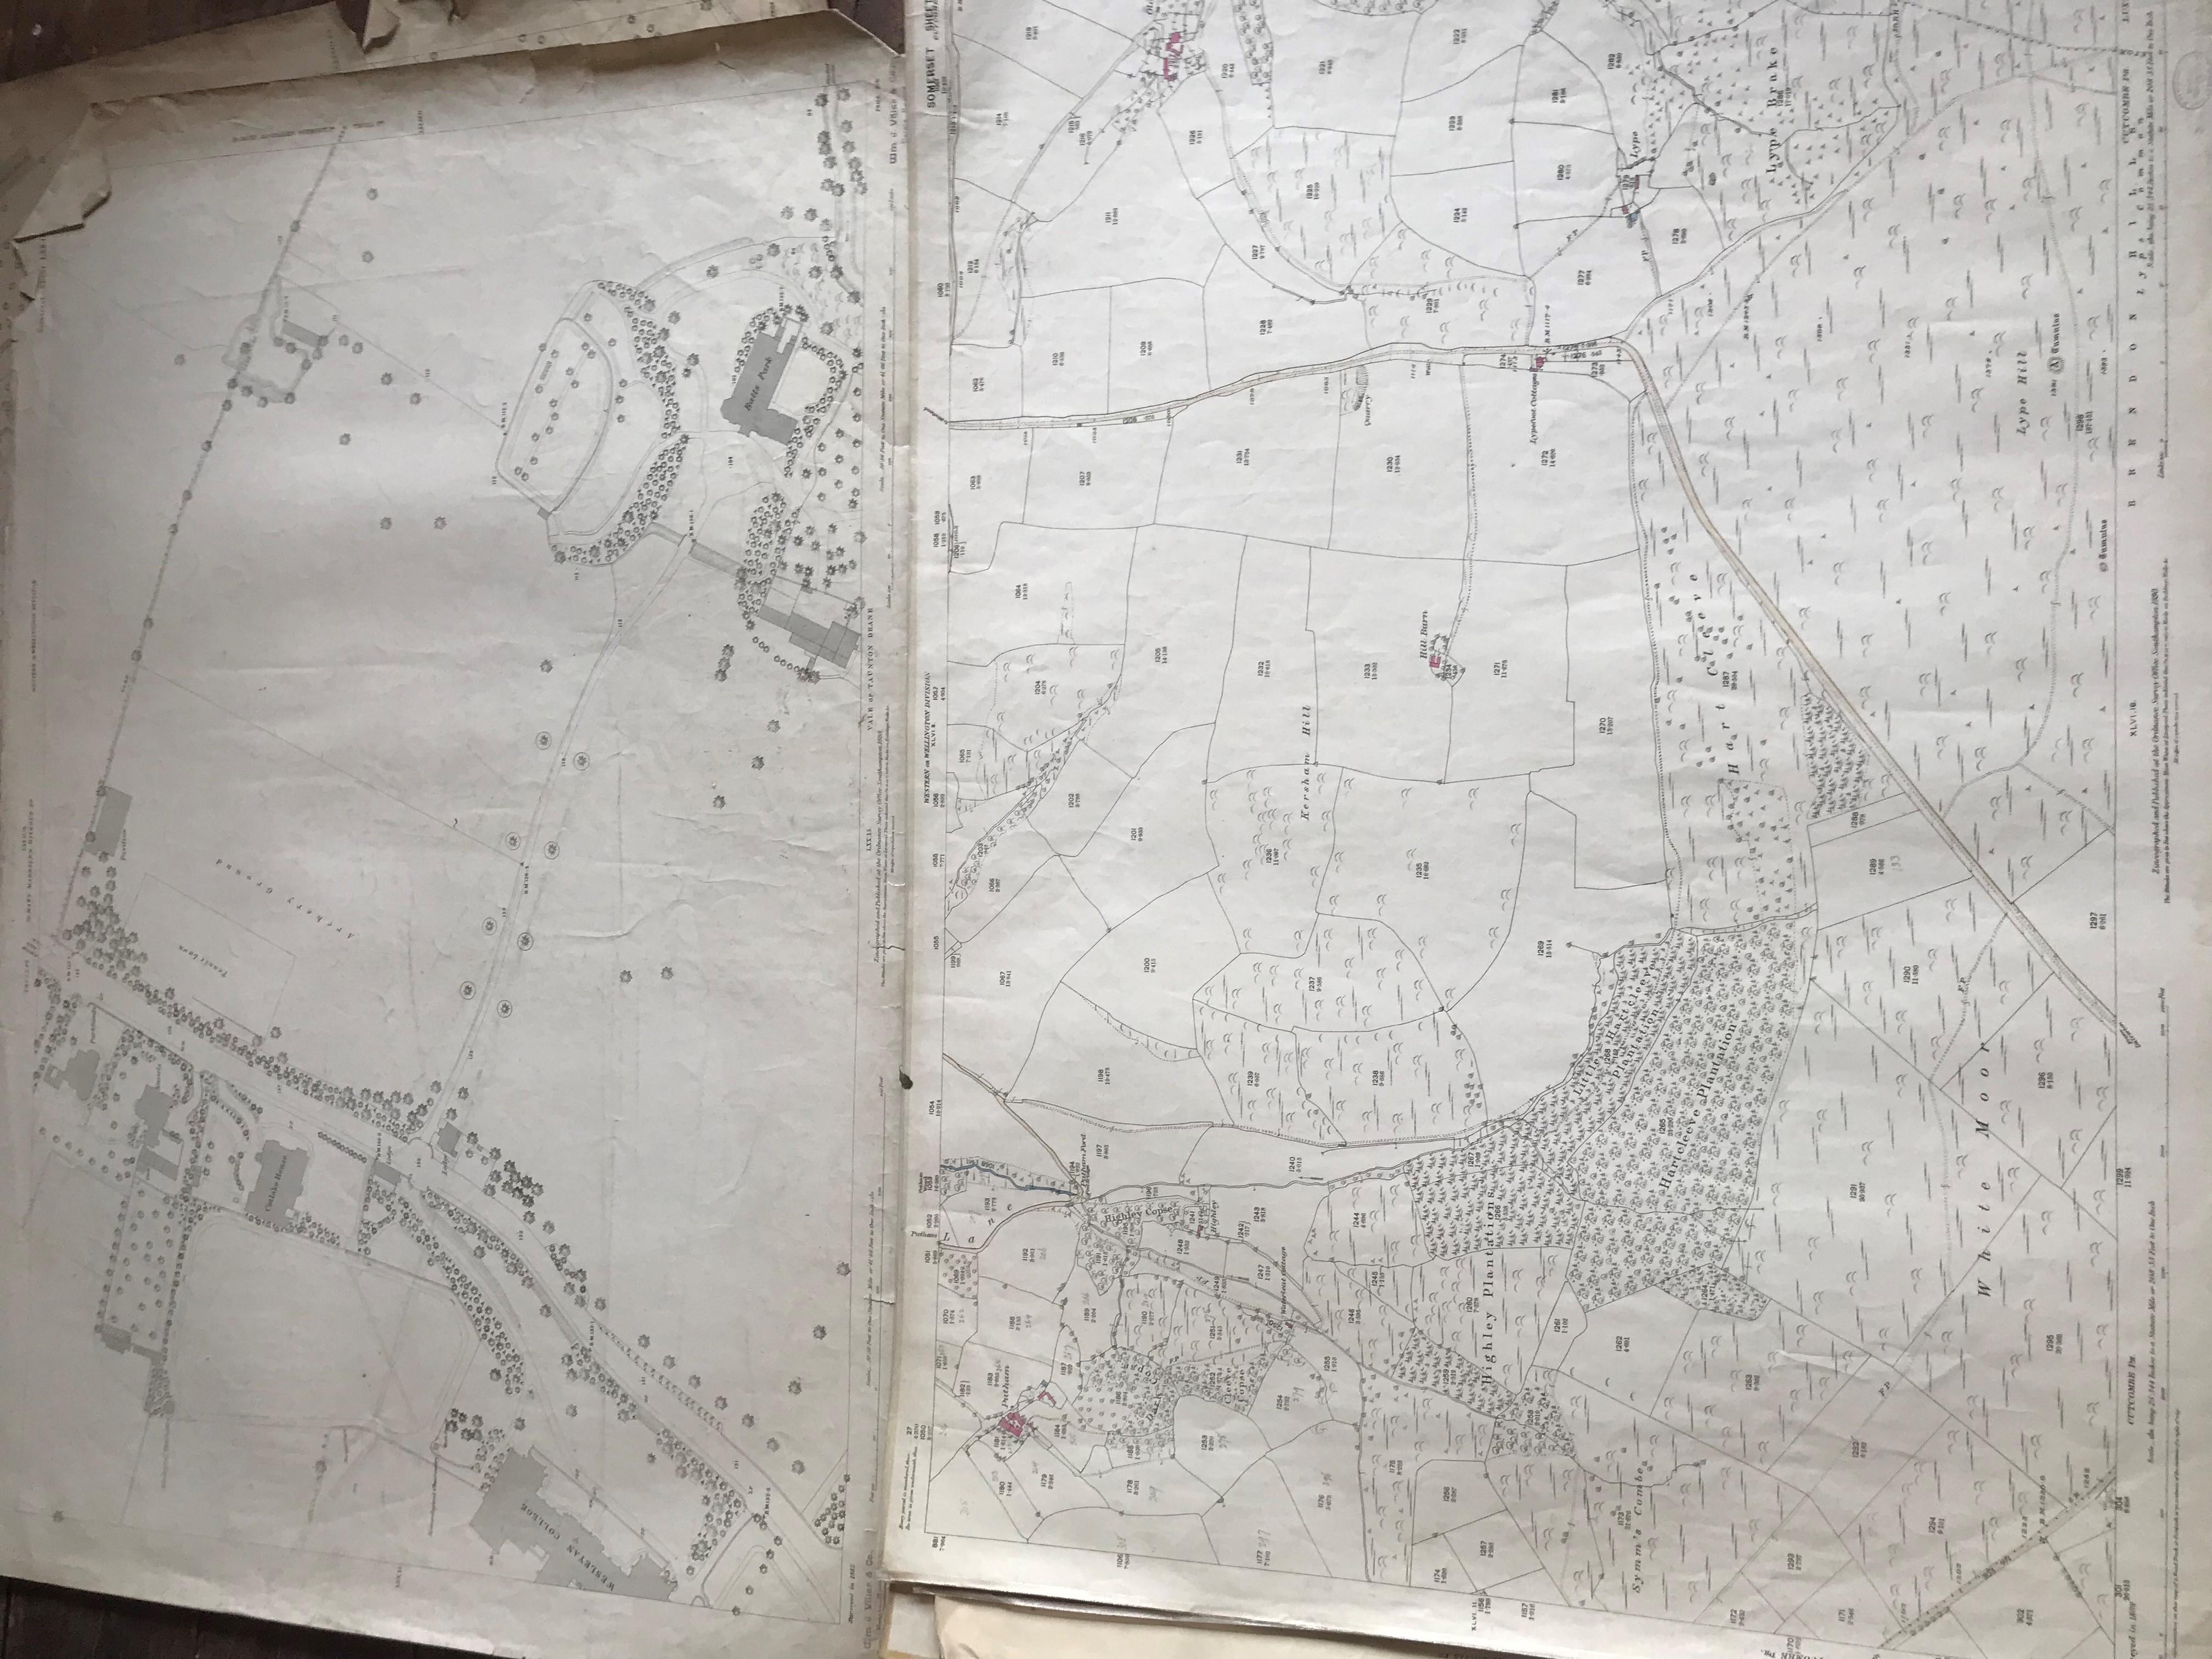 THIRTY 1:2500 ORDNANCE SURVEY MAPS featuring Chelston, Ham, Sampford Brett, Wellington, - Image 9 of 16